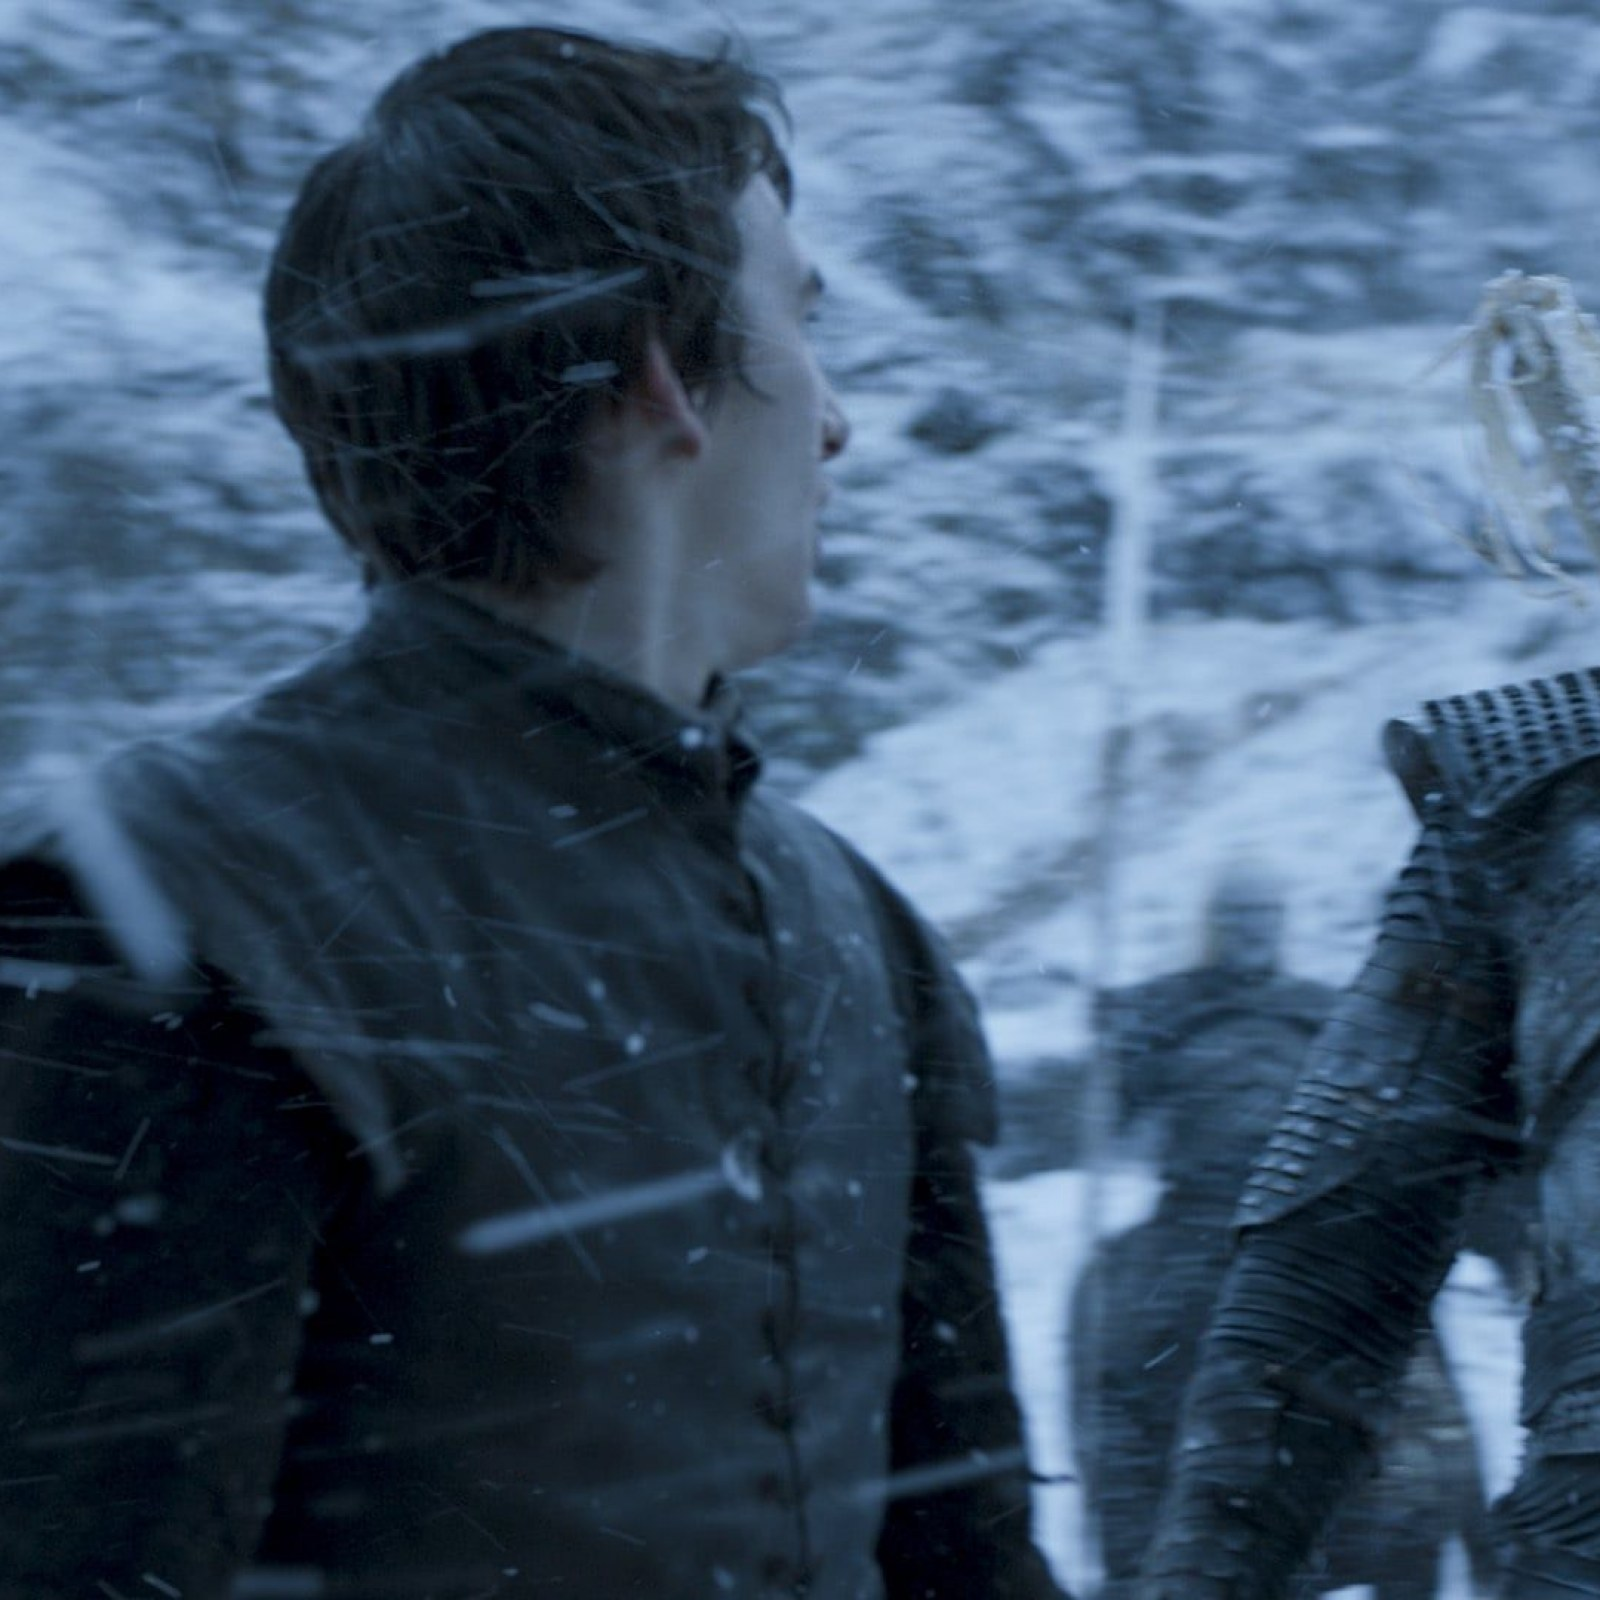 Game of Thrones' Season 8: Bran Stark Night King Theory Debunked